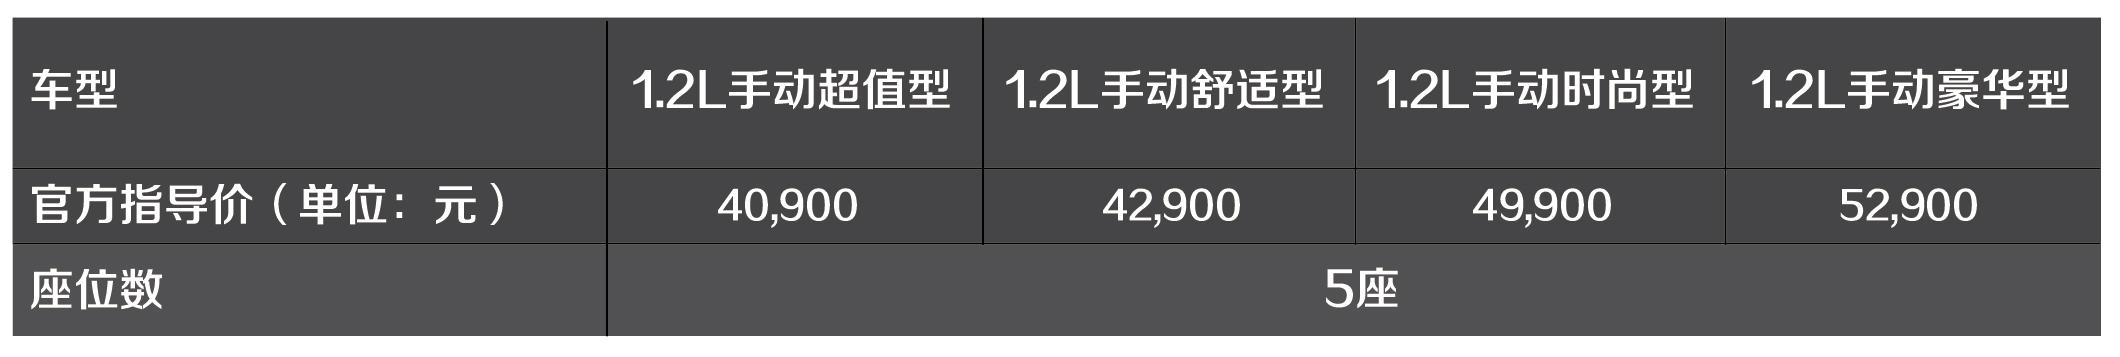 寶(bao)駿(jun)310參(can)數配置(zhi),報價(jia)